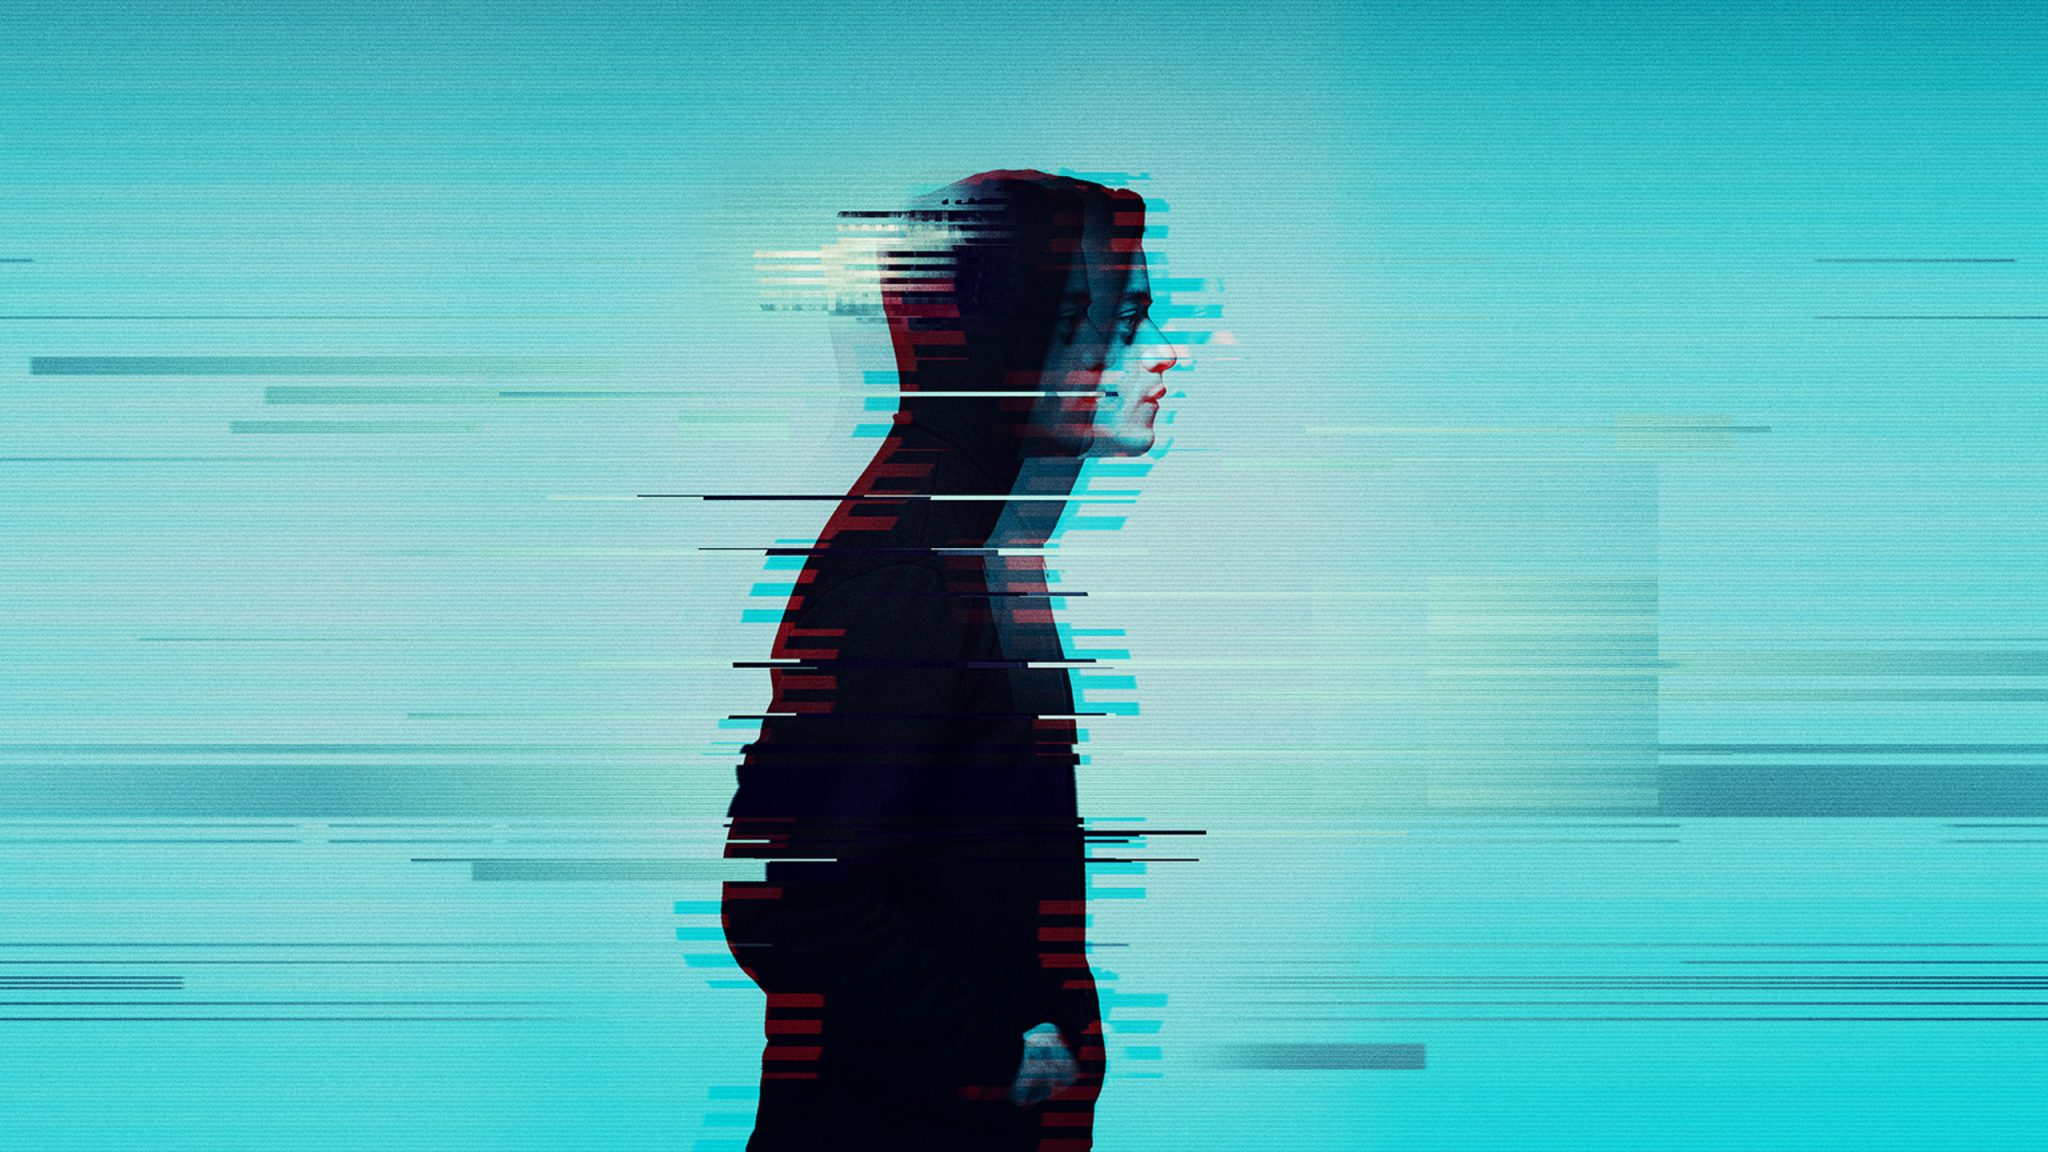 Mr.-Robot-3.jpg